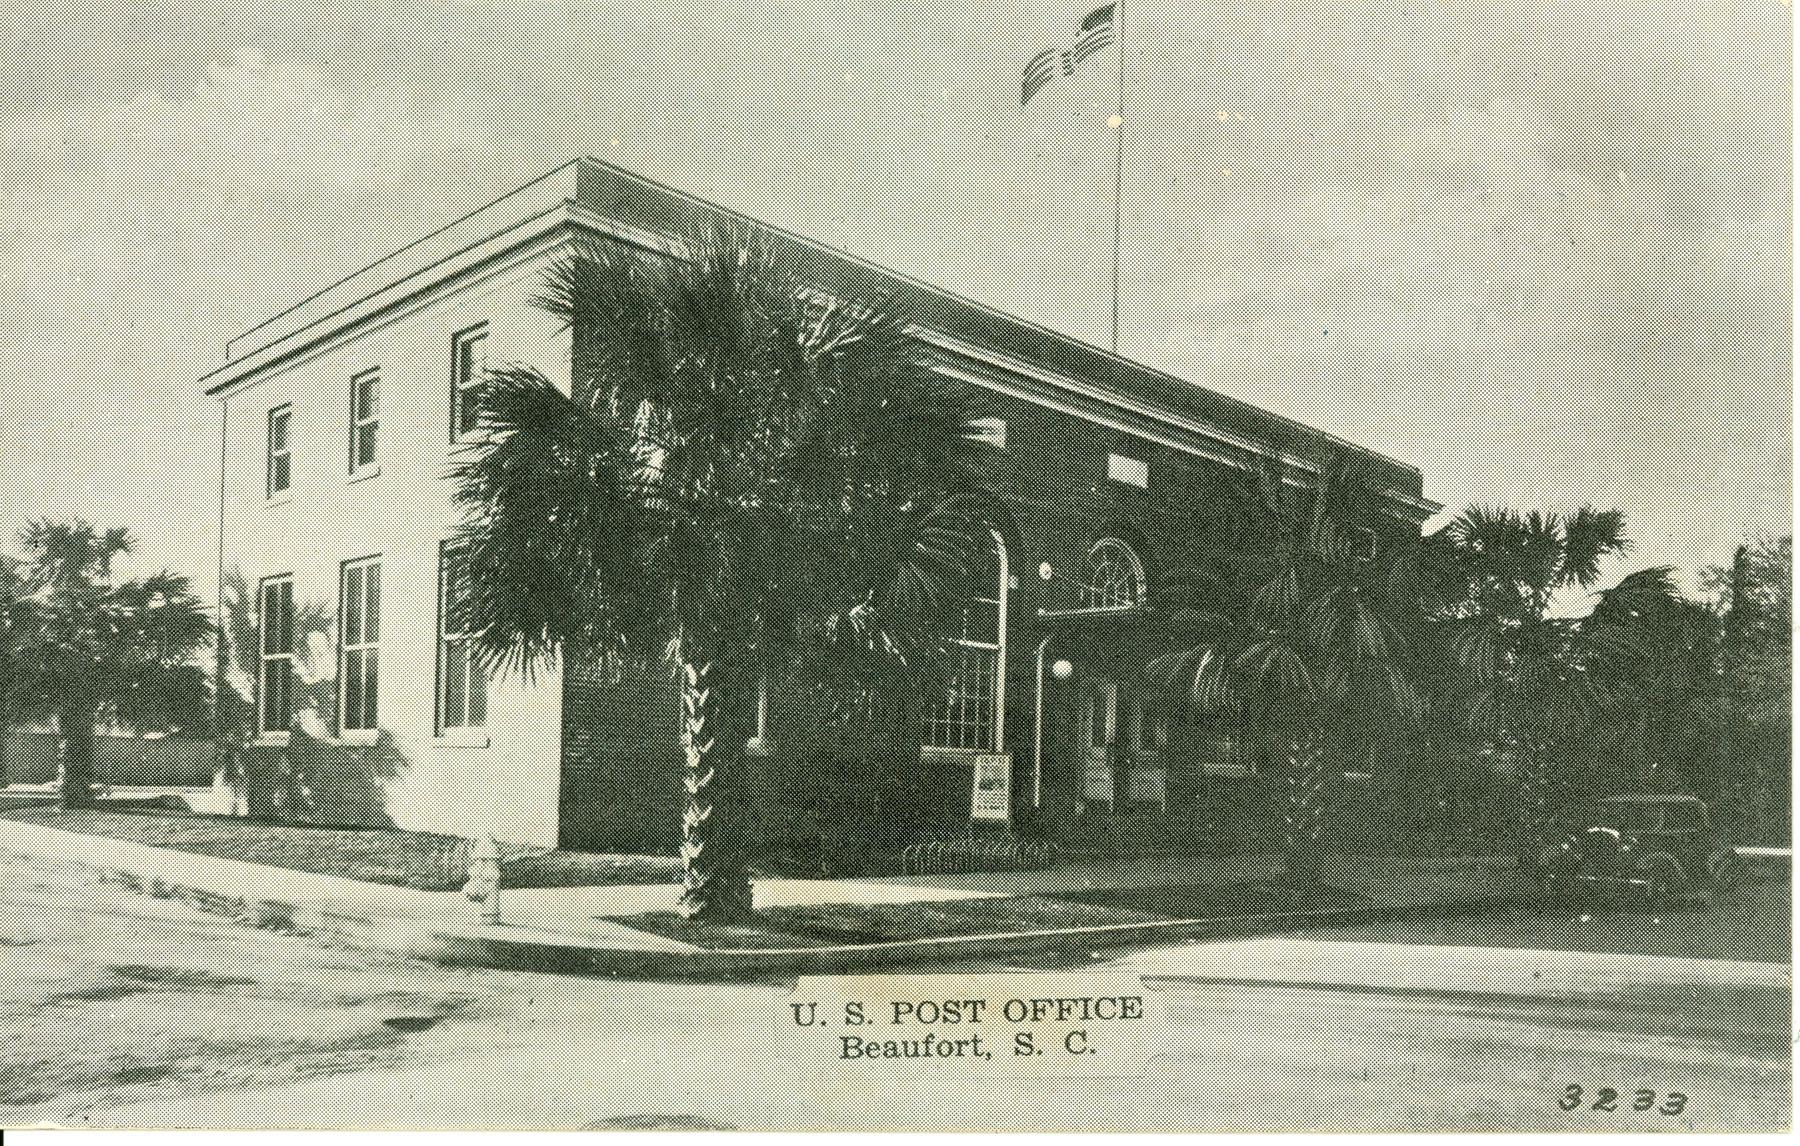 U.S. Post Office Beaufort